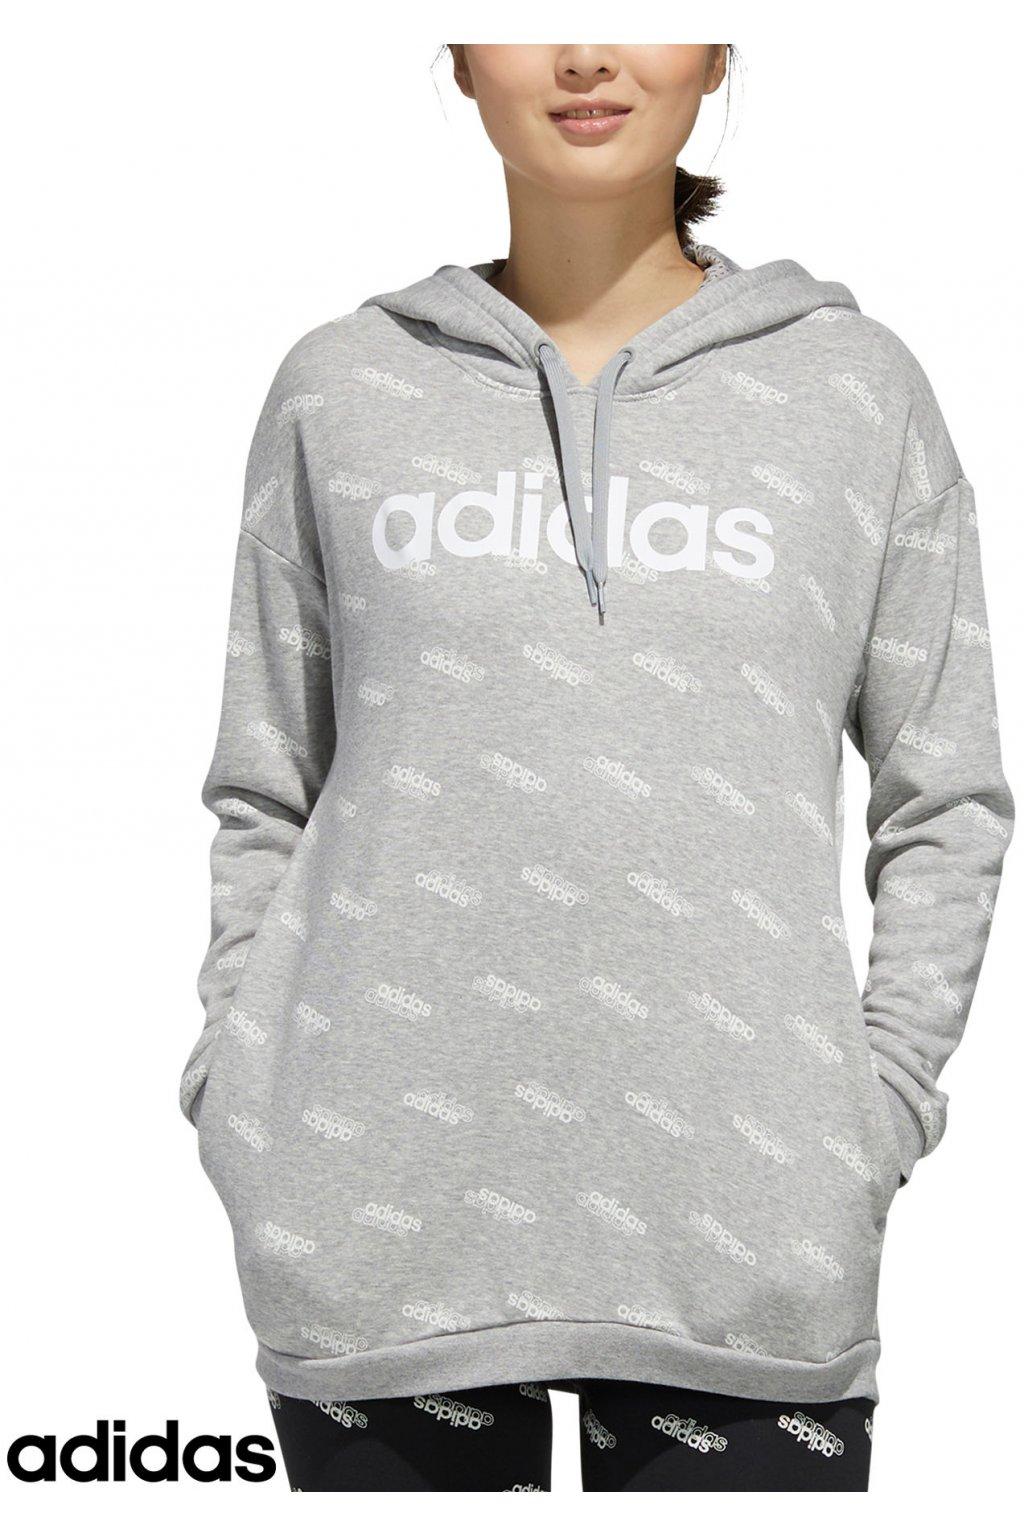 fn0944 damska mikina adidas favourites hooded